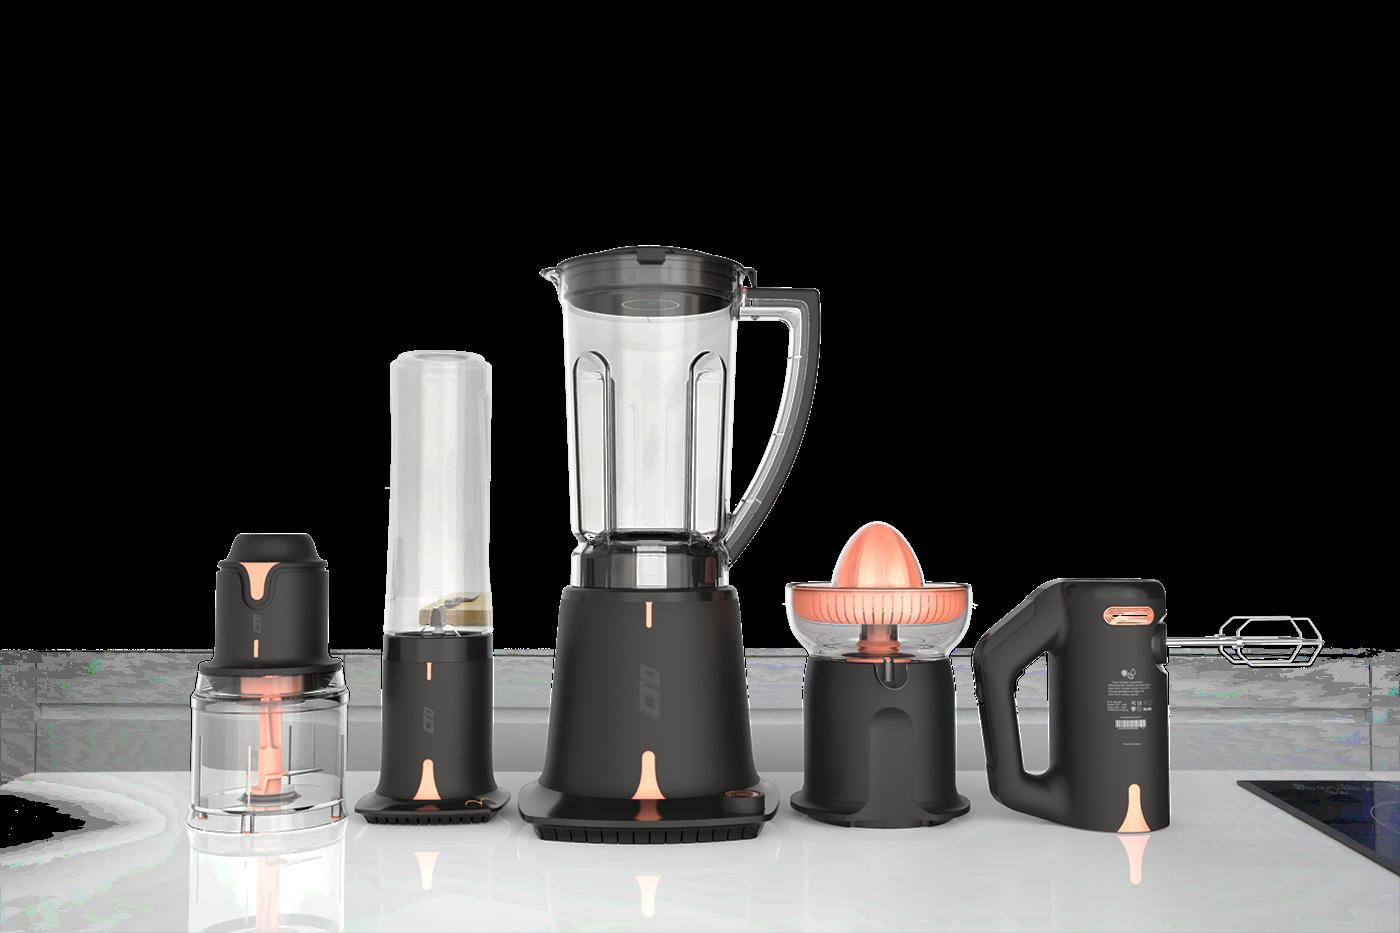 chitco kitchen series on behance